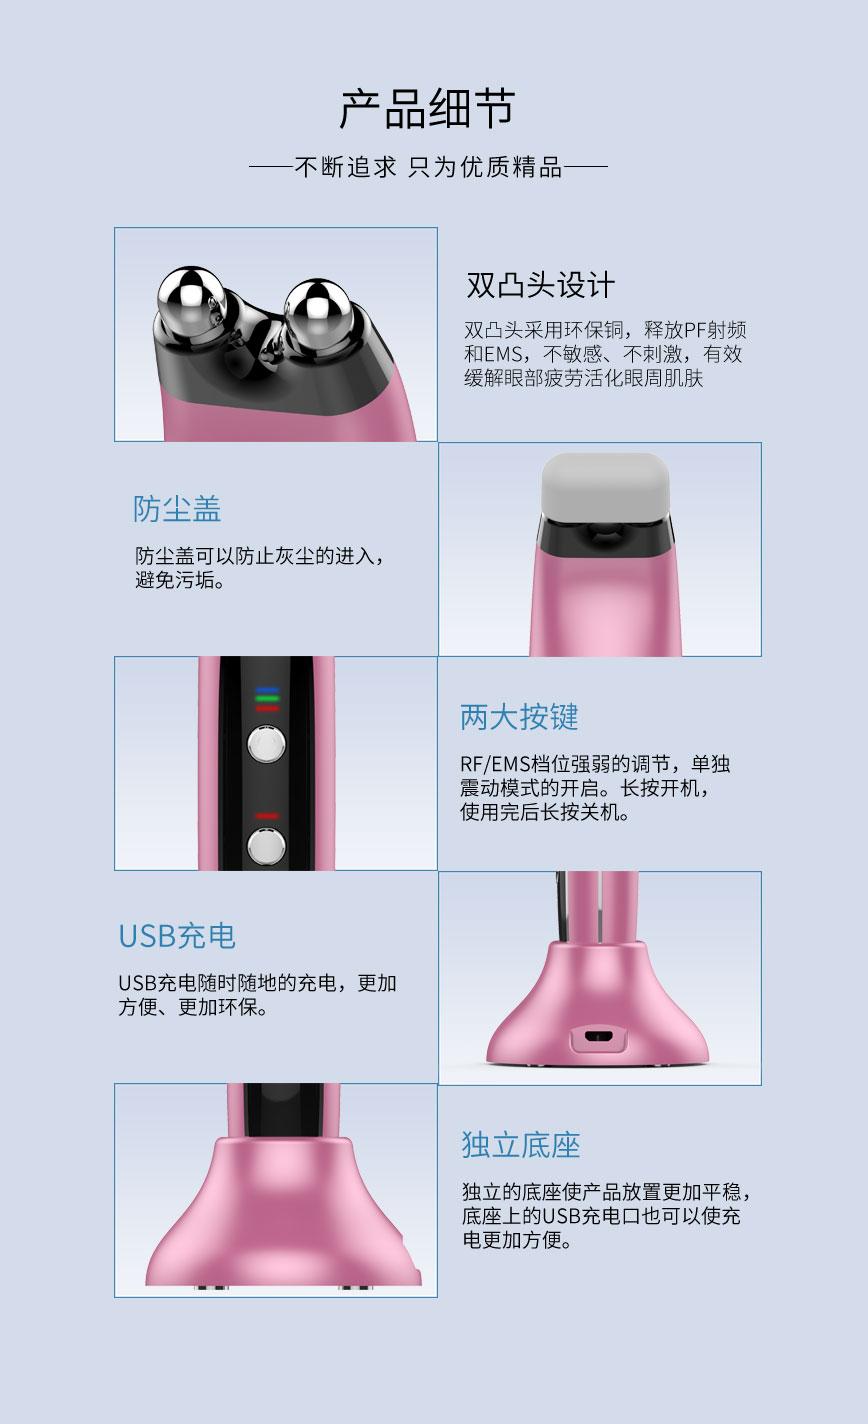 RF EMS多功能美眼仪 产品细节展示